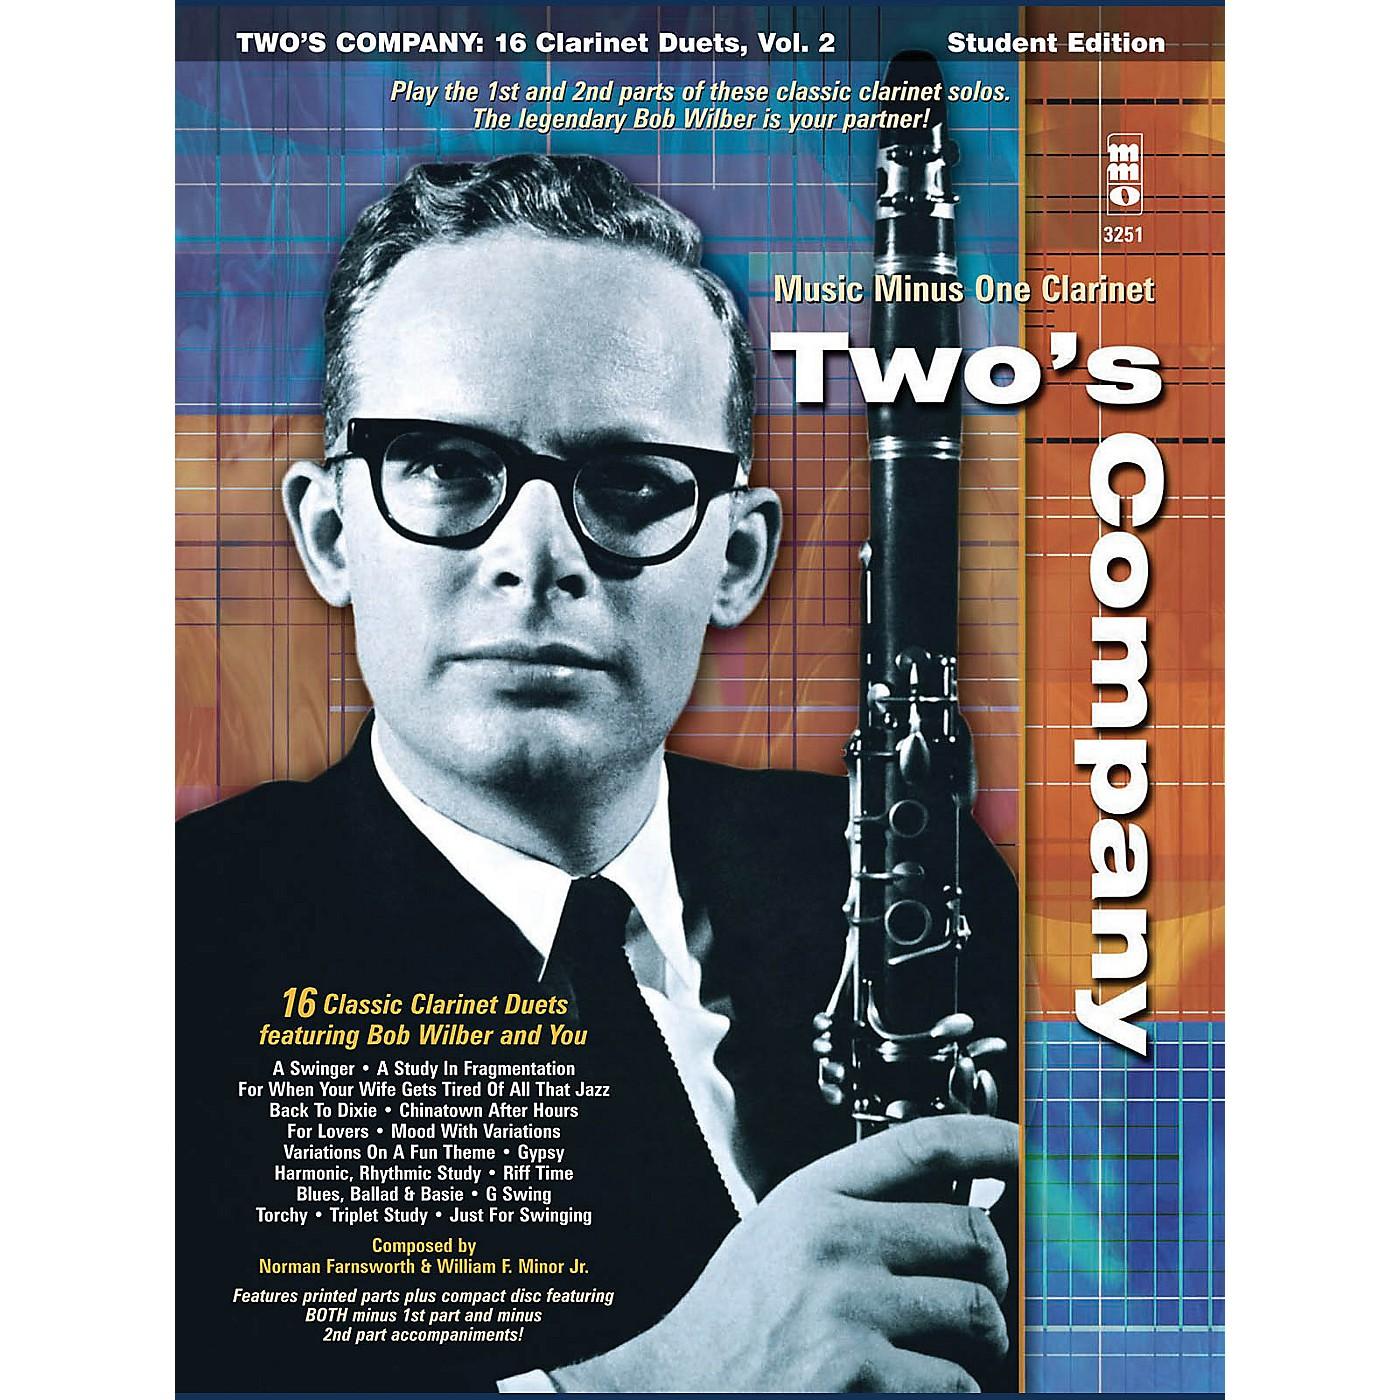 Music Minus One Bob Wilbur - Two's Company: 16 Clarinet Duets Music Minus One Series BK/CD by Bob Wilbur thumbnail